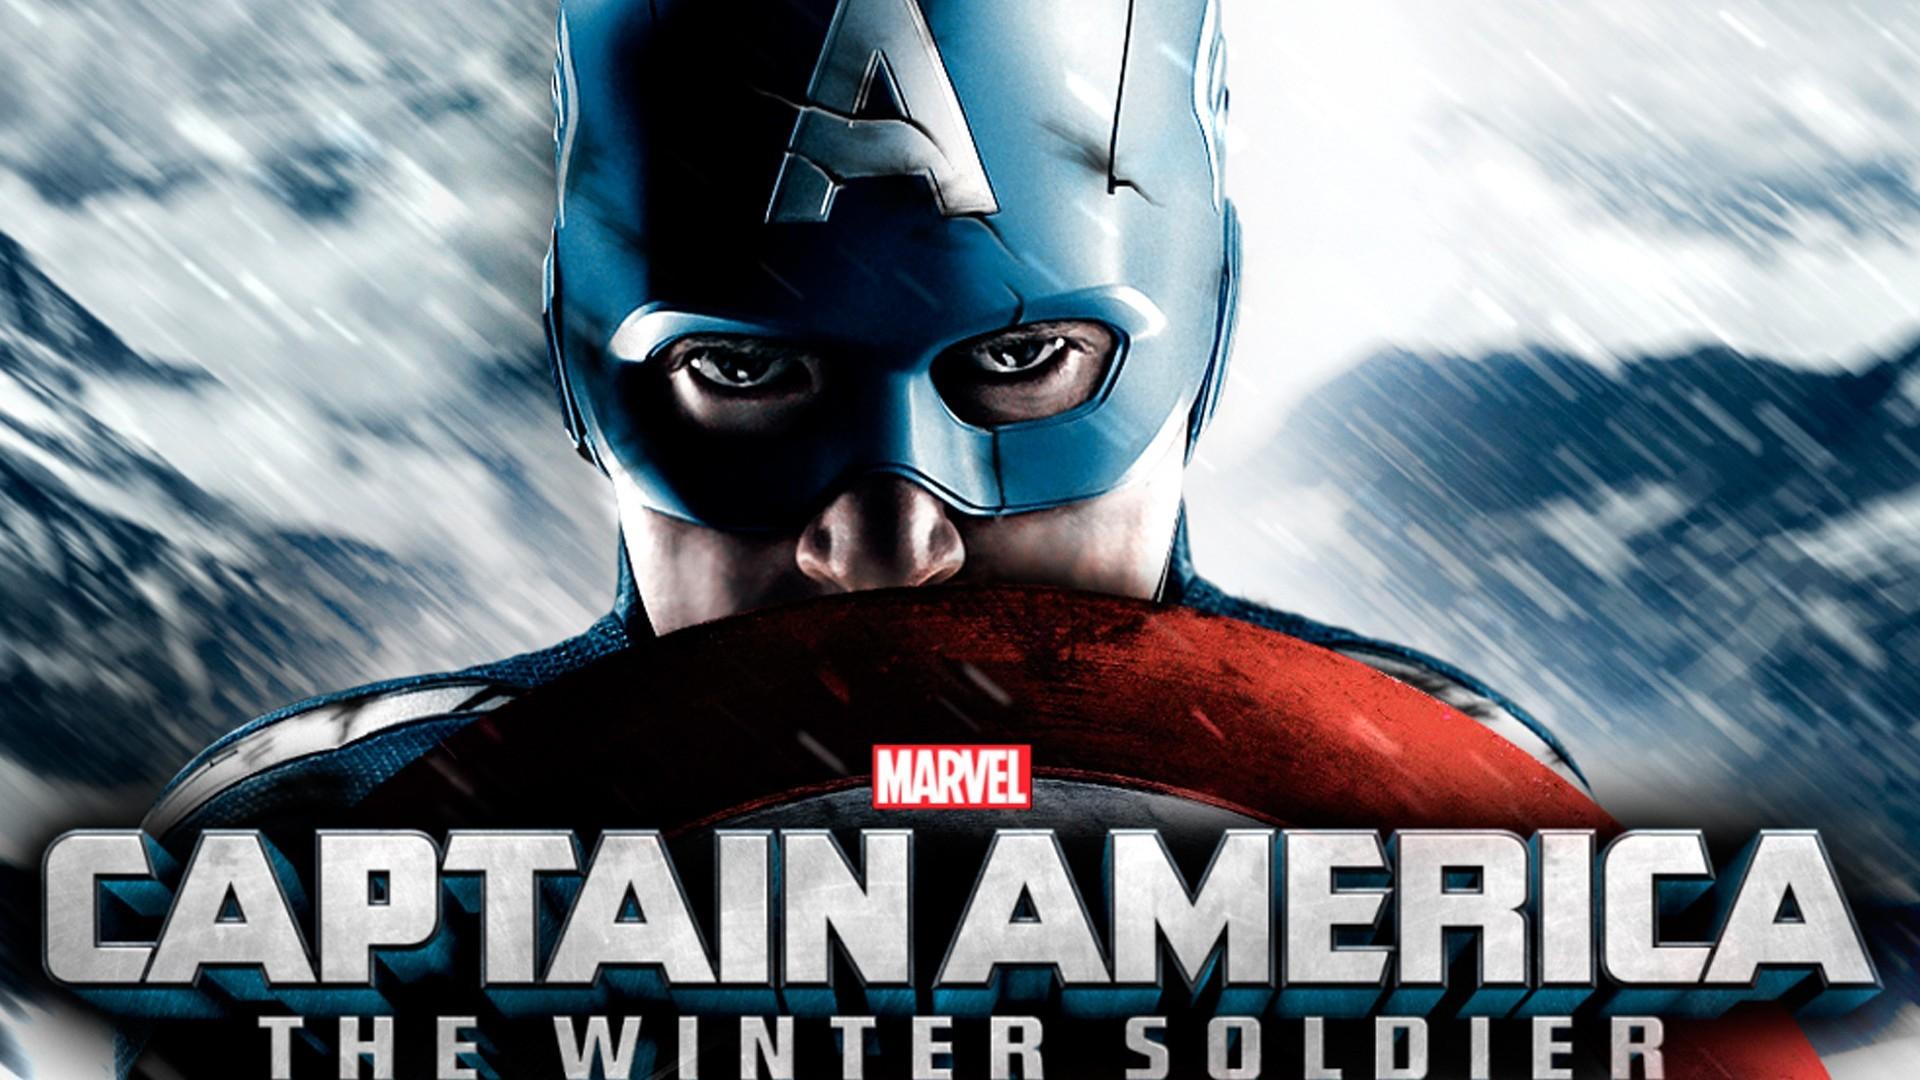 … Winter Soldier wallpaper 10. download wallpaper